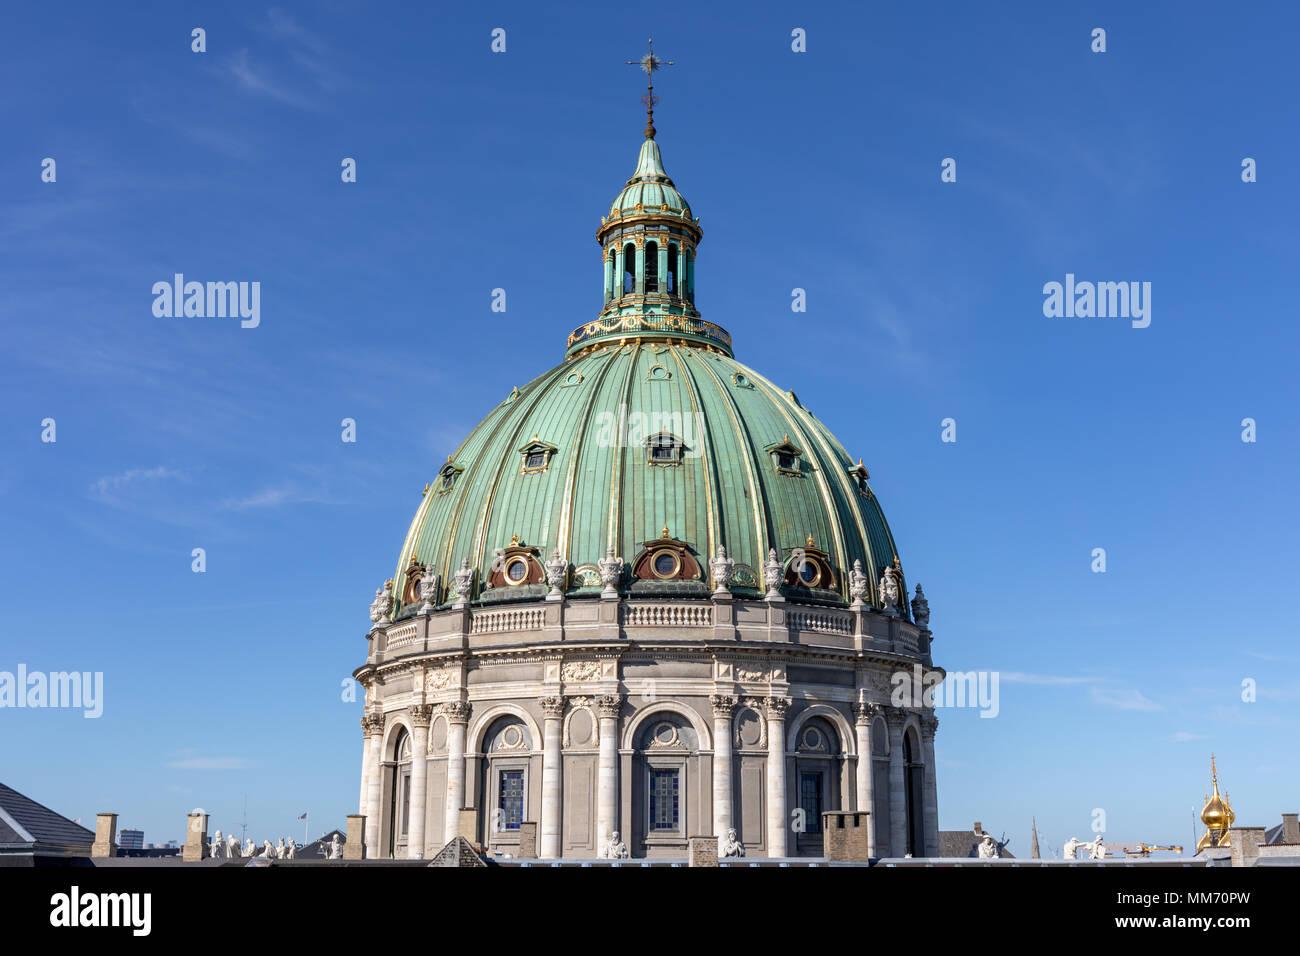 The dome of Frederik's Church (The Marble Church), Copenhagen, Denmark - Stock Image